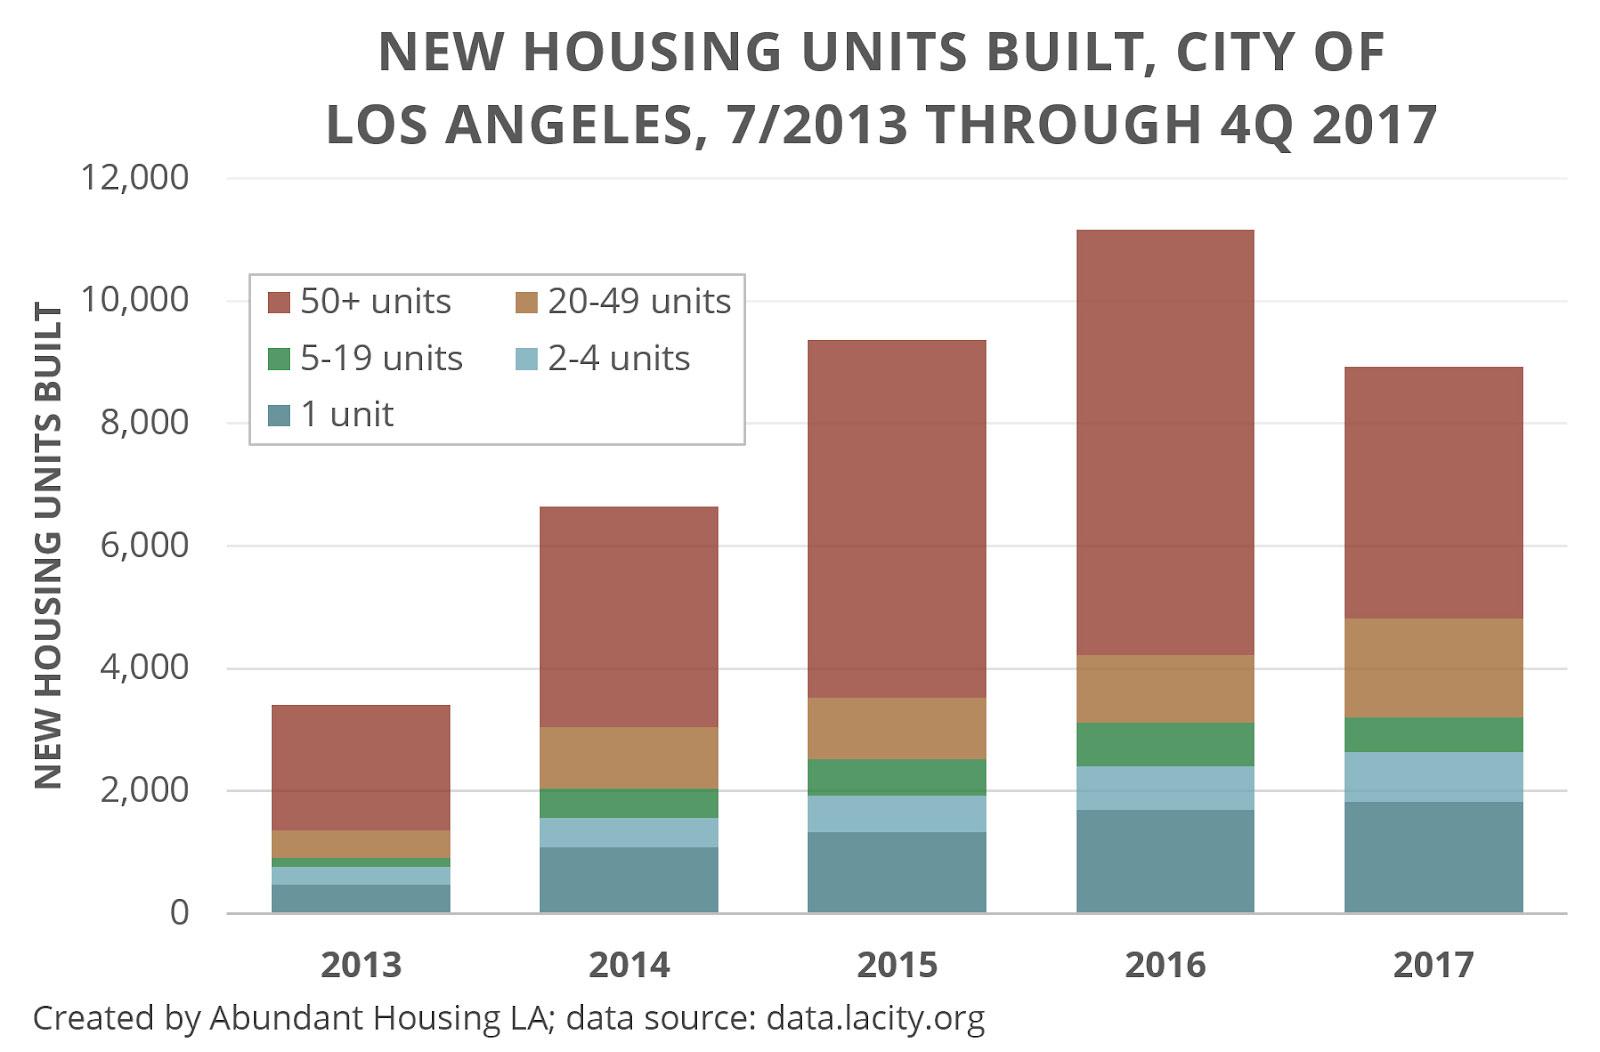 new housing units built in quarter 4